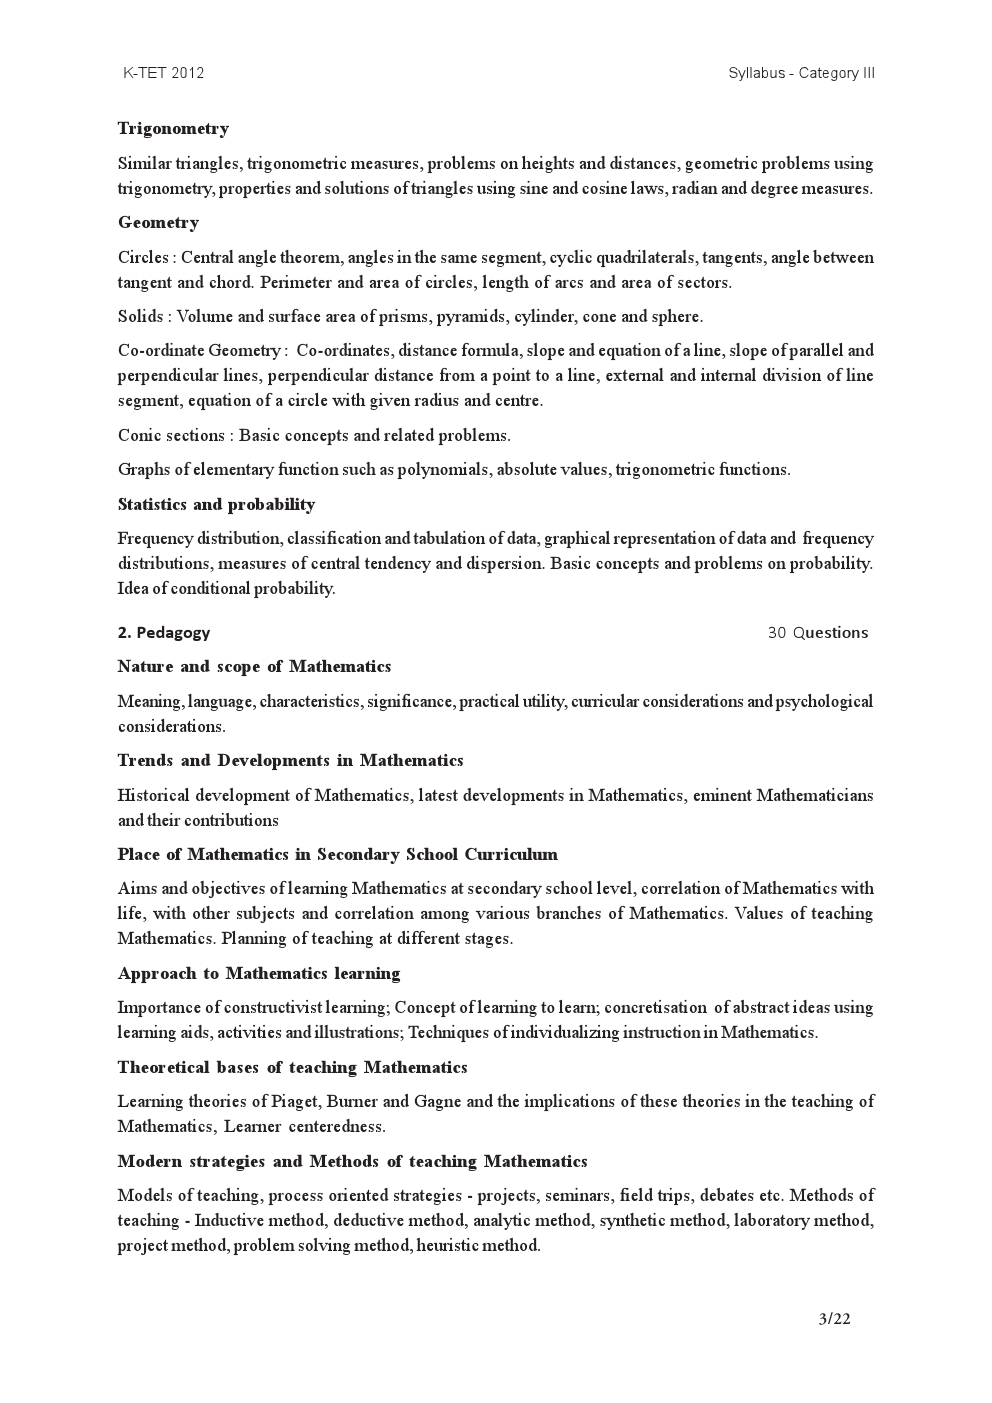 http://masterstudy.net/pdf/syllabus30022.jpg